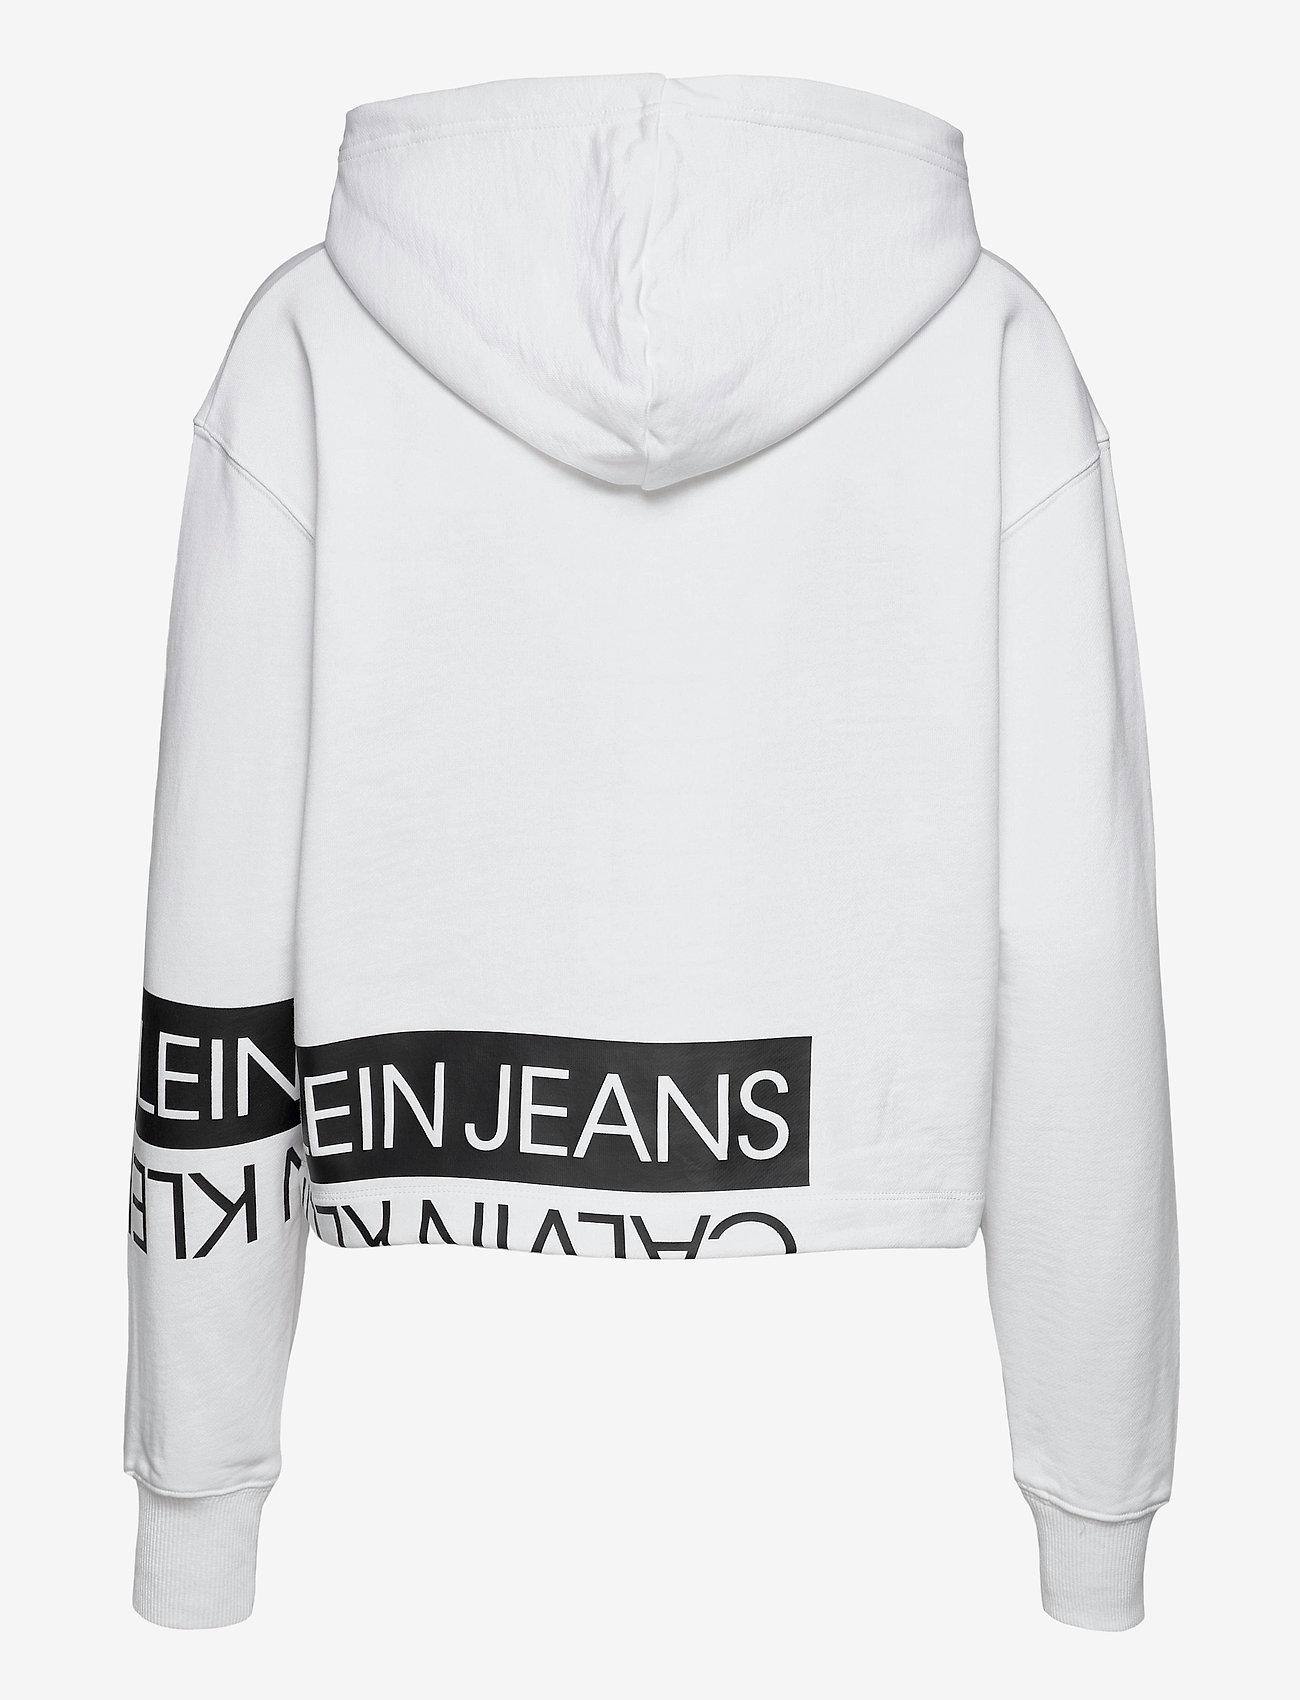 Calvin Klein Jeans - MIRRORED LOGO HOODIE - gensere og hettegensere - bright white / ck black - 1